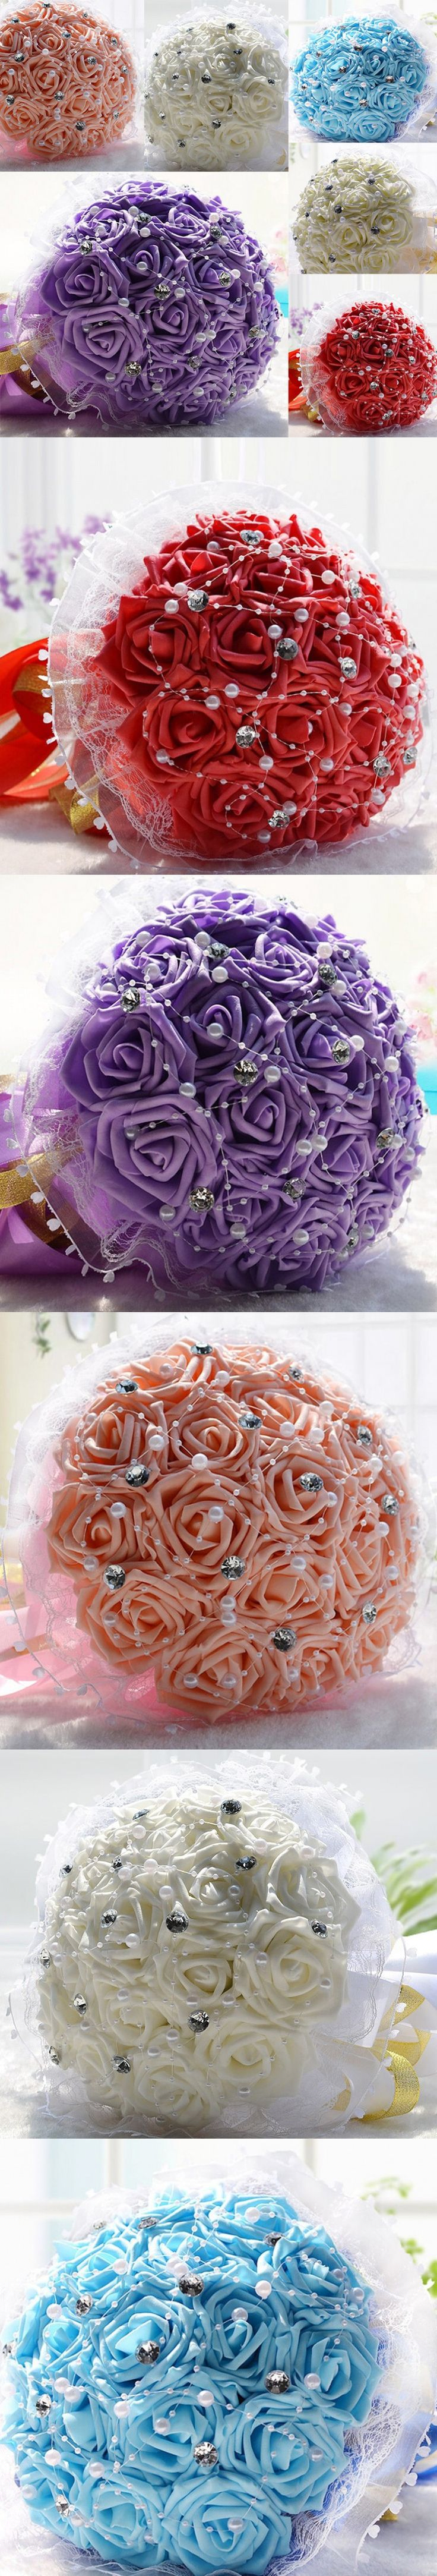 New Fashion Rose Crystal Pearls Wedding Flowers Fast Shipping Bride Wedding Bouquet 2015 New buque de noiva